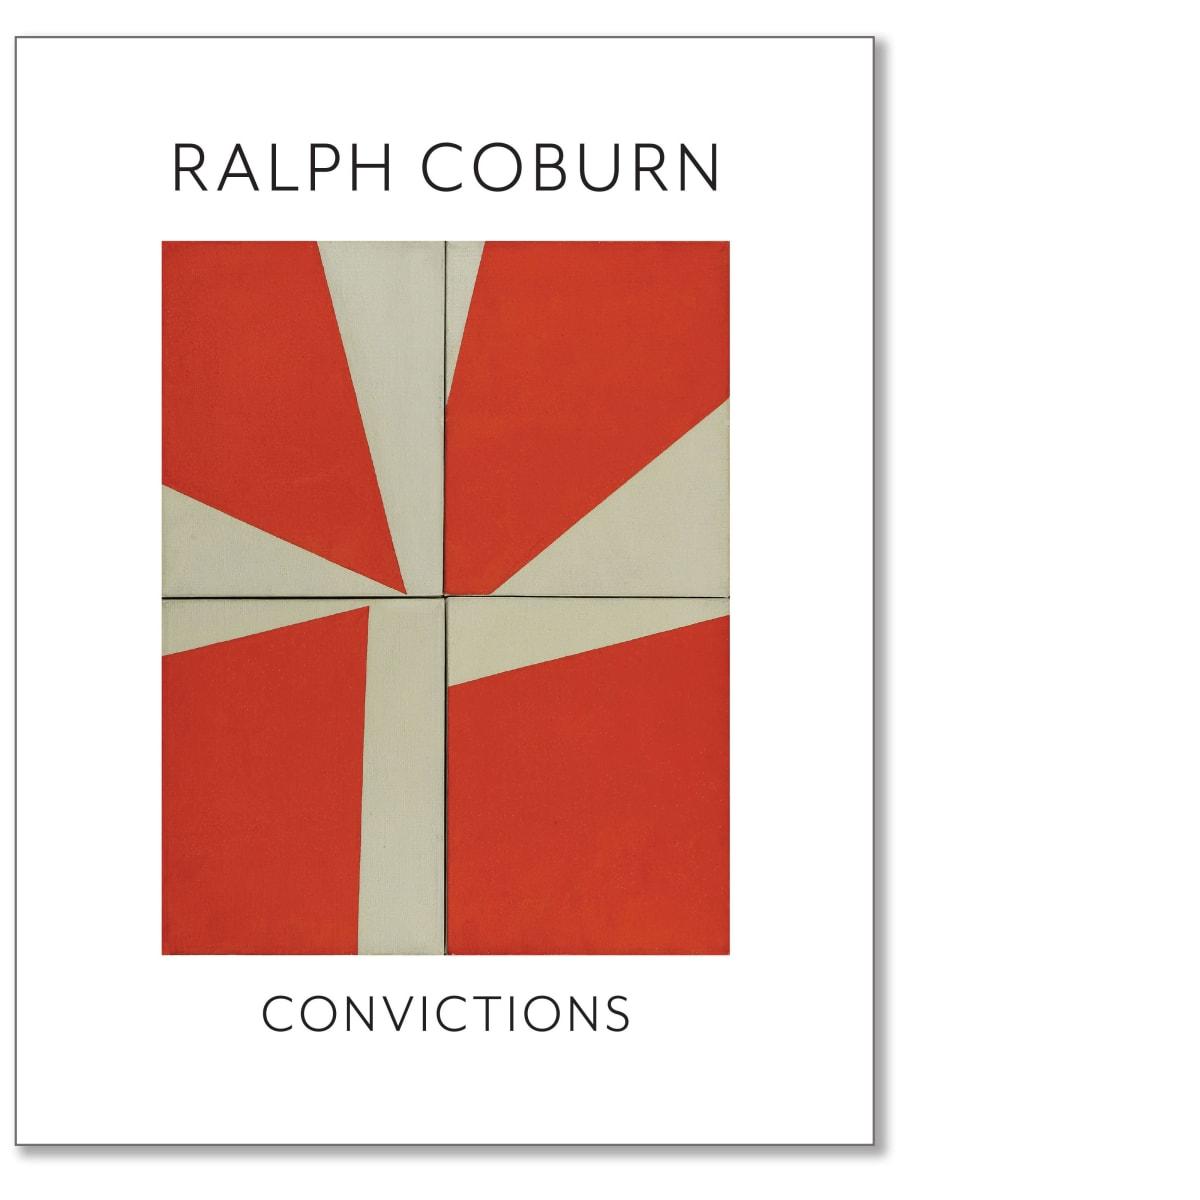 Ralph Coburn